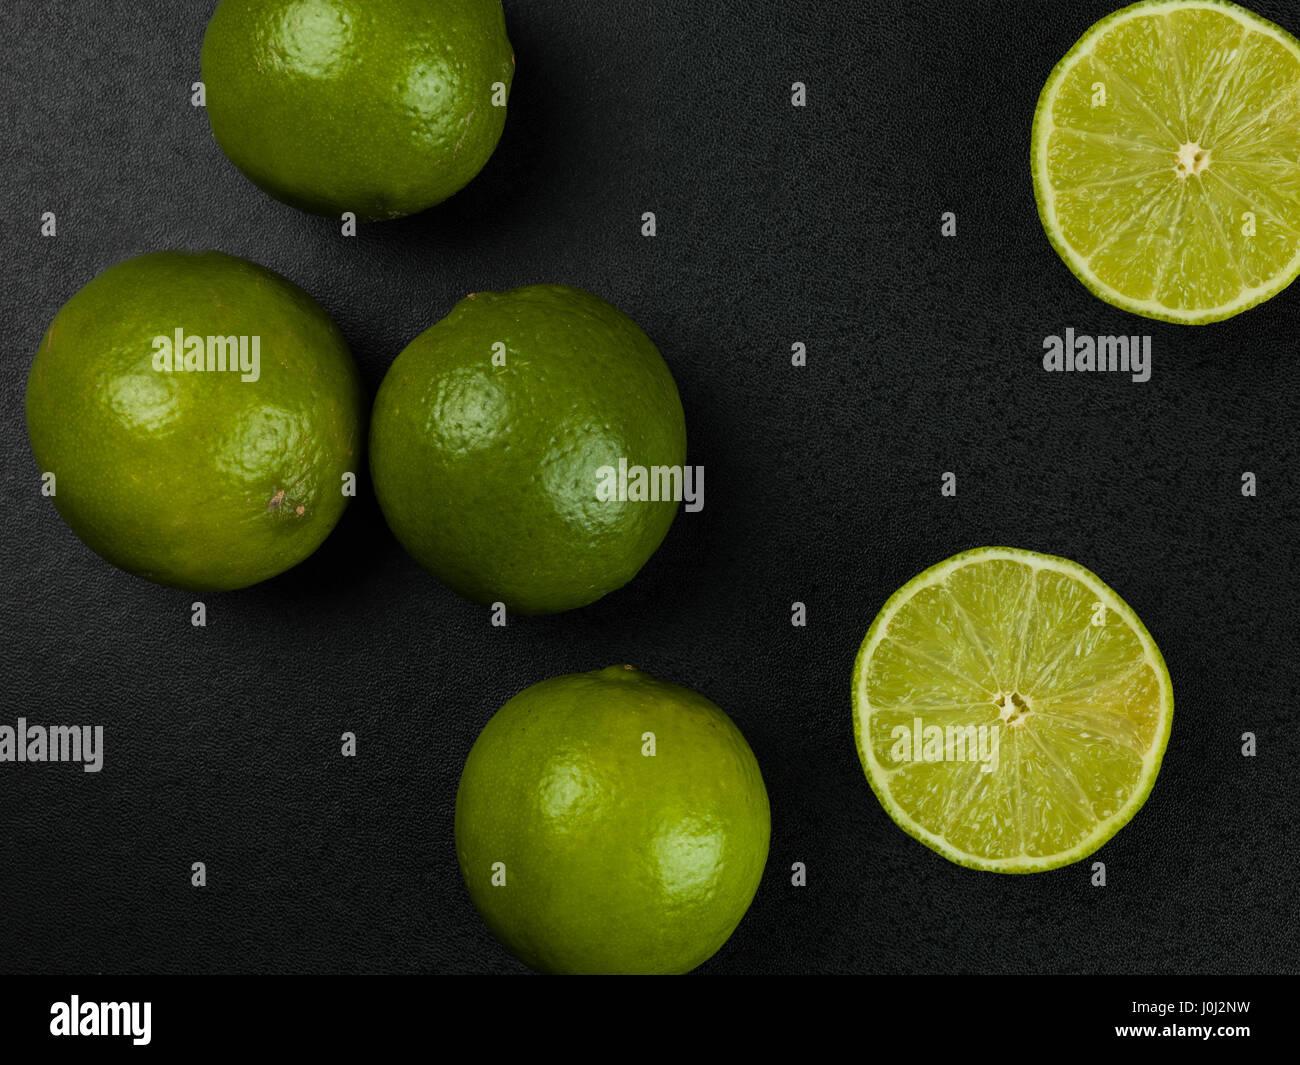 Fresh Ripe Juicy Limes Citrus Fruit Against a Black Background - Stock Image